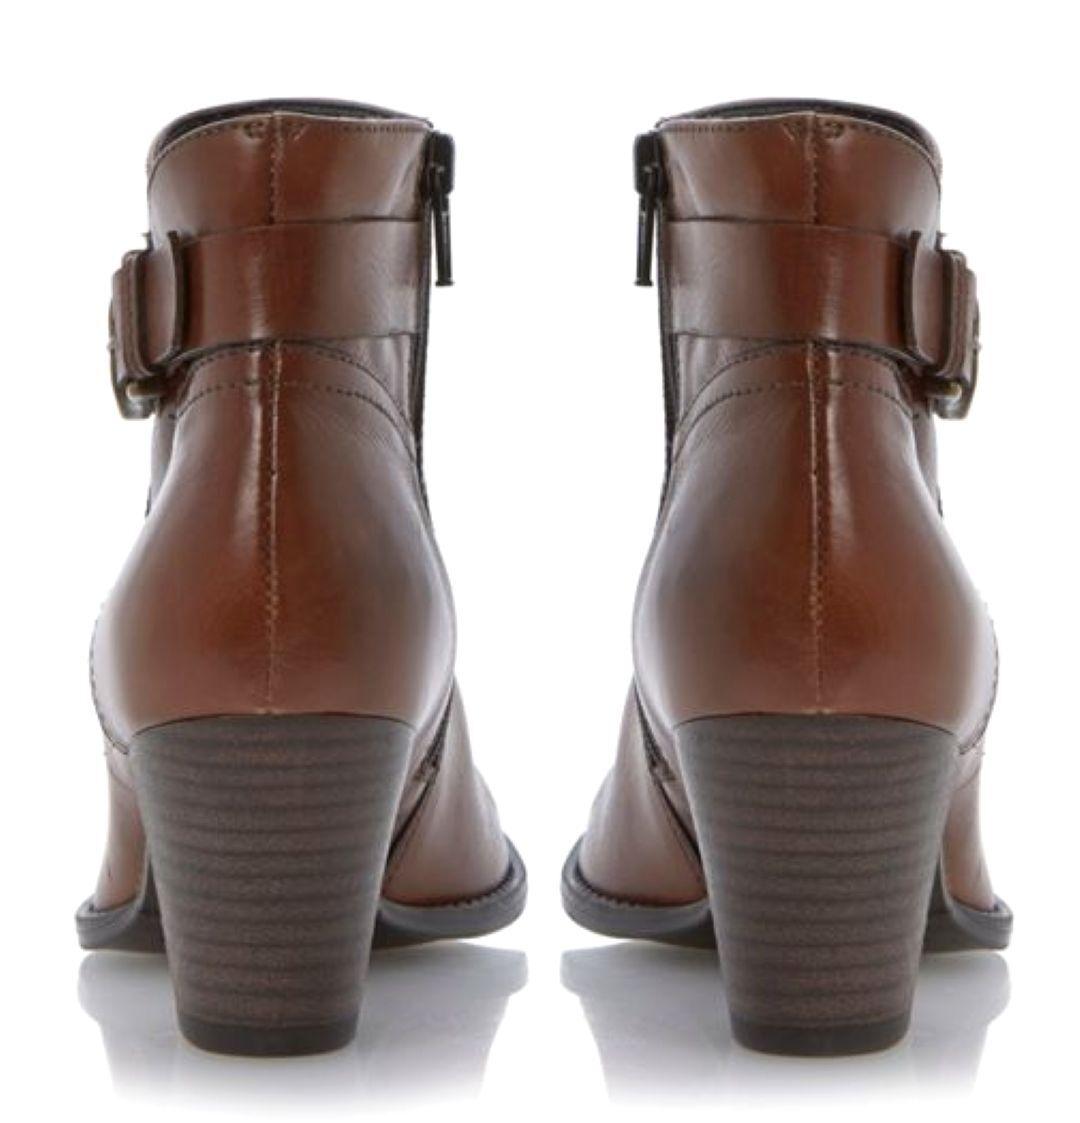 Linea Braun UK 7 Nordal Tan Braun Linea Leder Side Buckle Zip Up Ankle Stiefel c3bc71